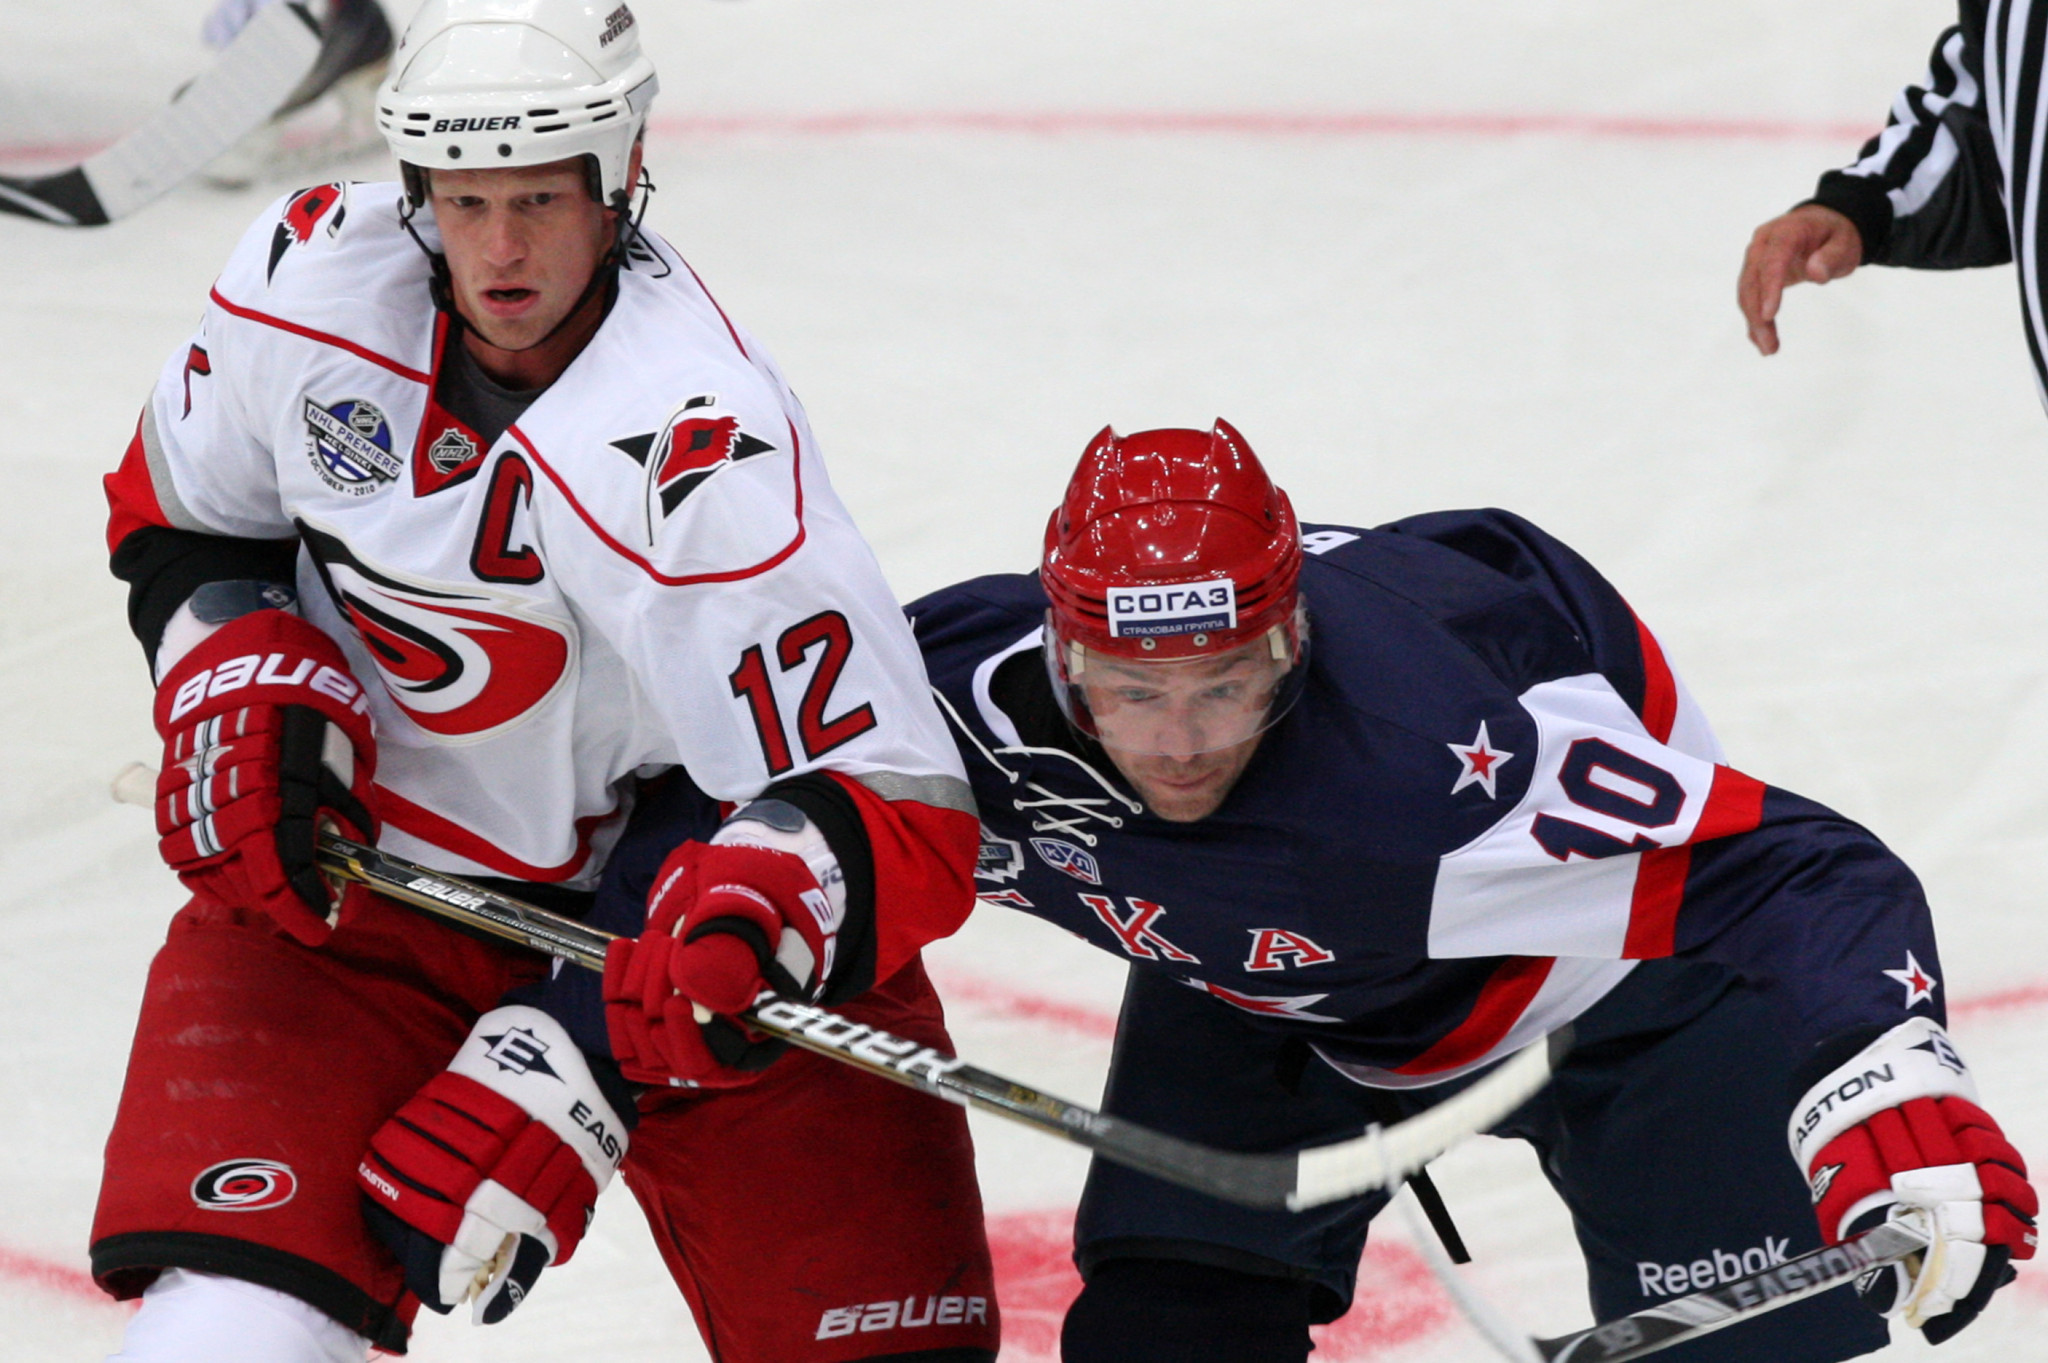 Gennady Timchenko is President of the SKA Saint Petersburg ice hockey team ©Getty Images